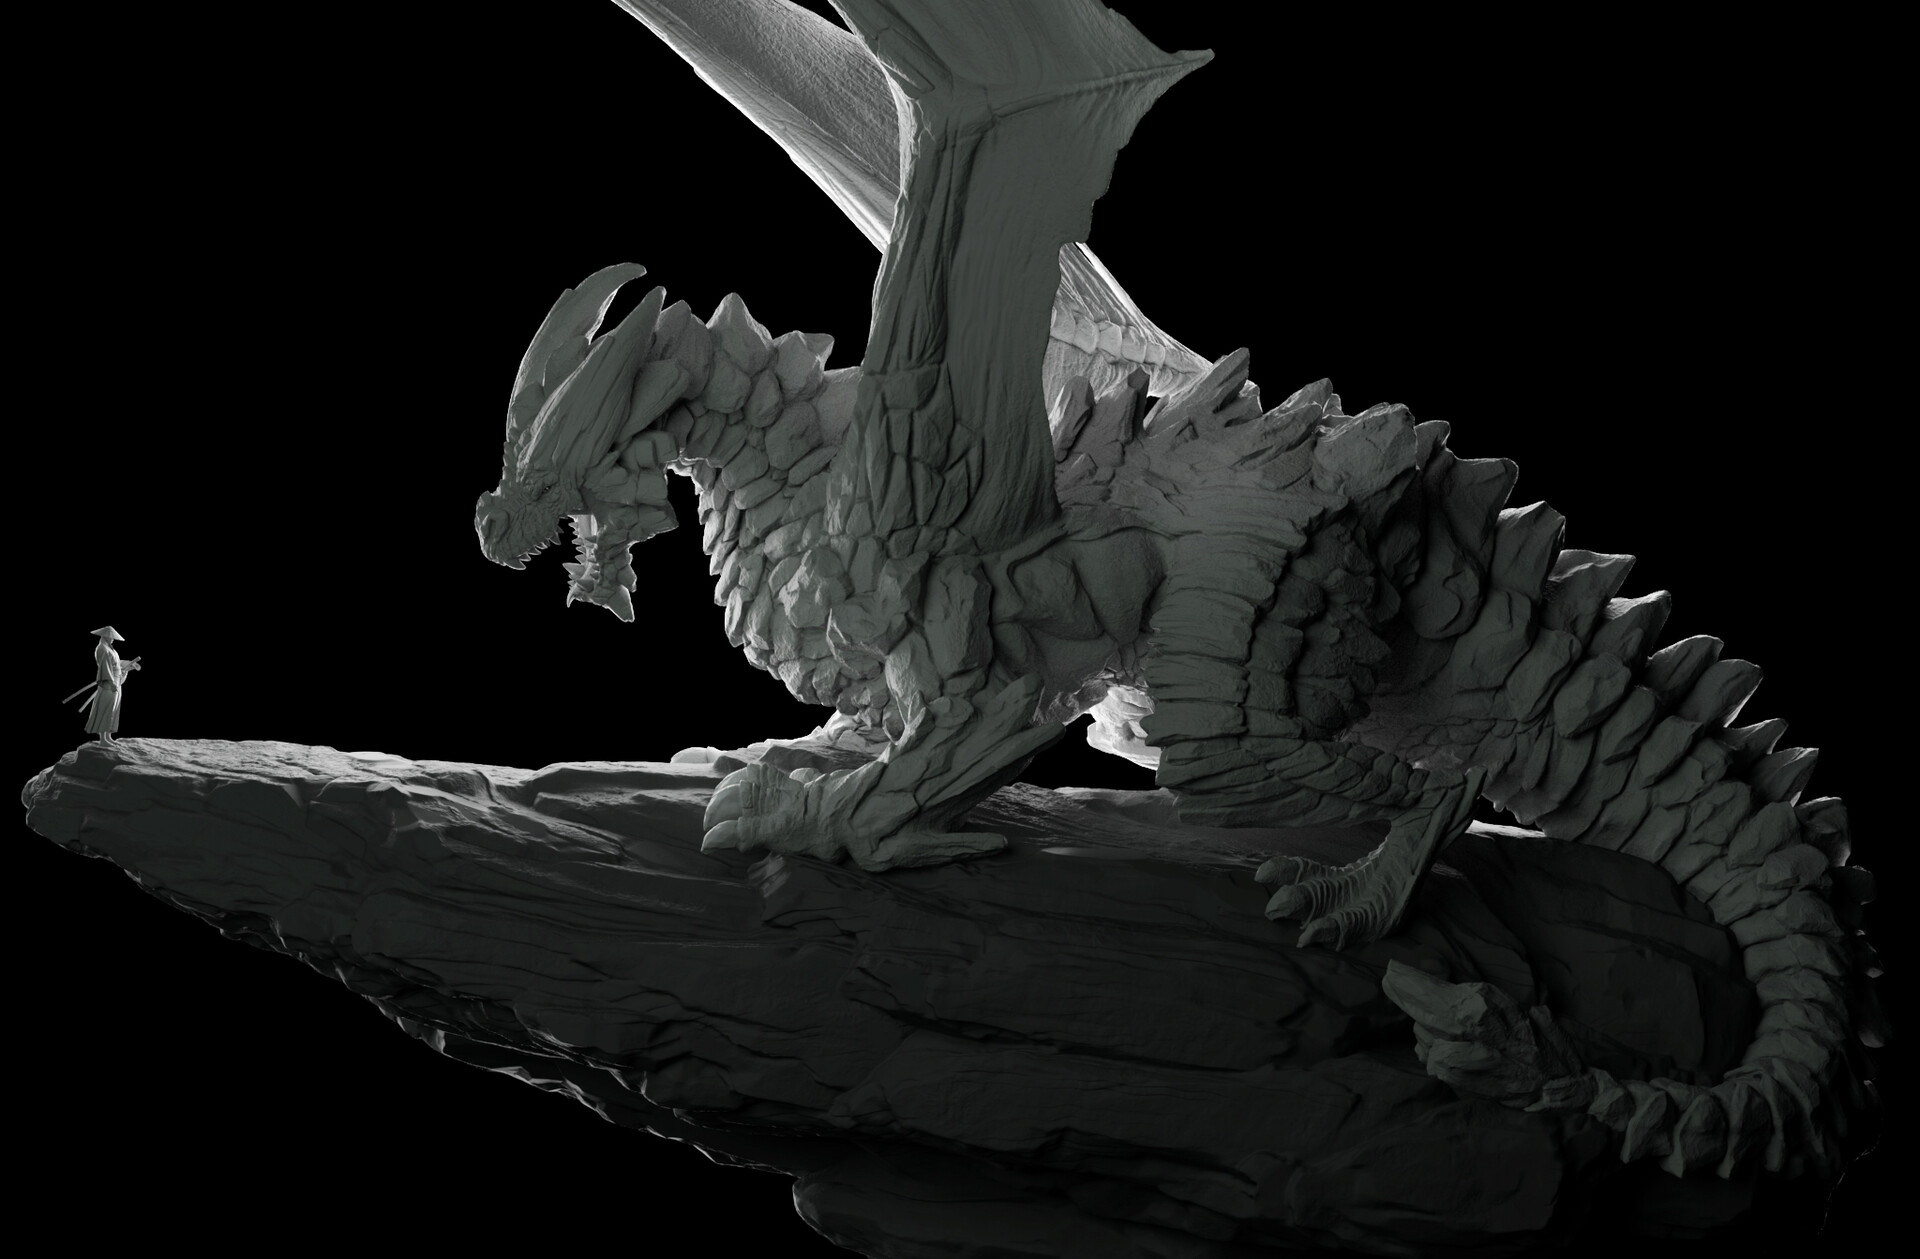 Sanjay singh dragon2